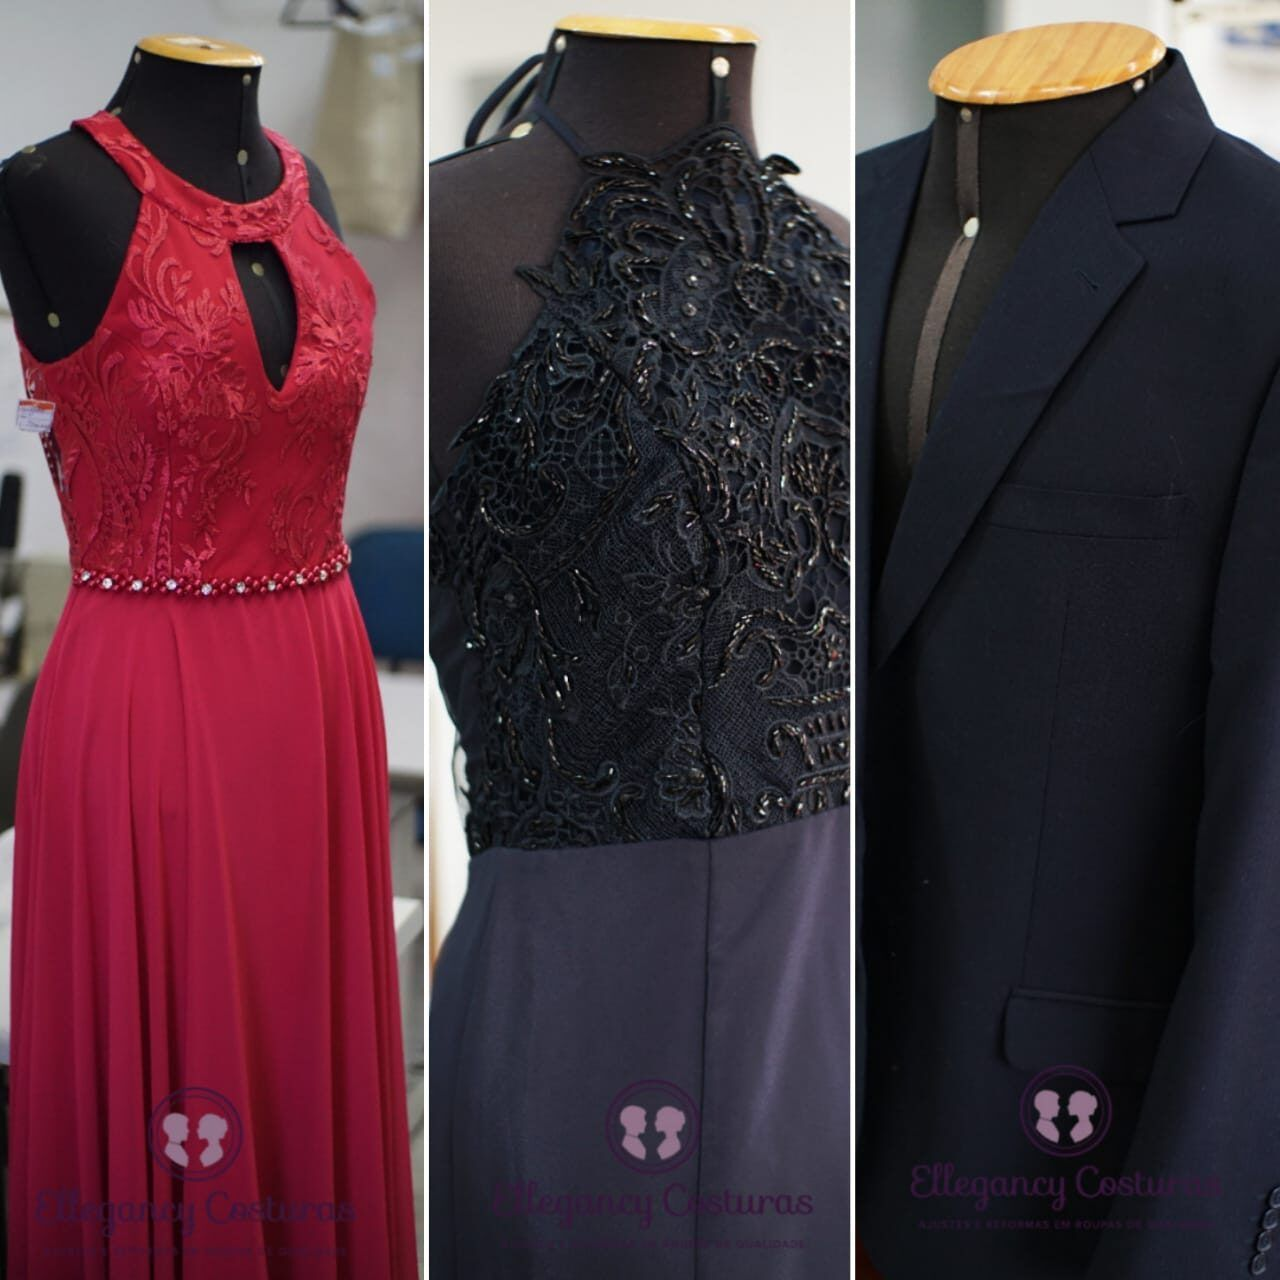 consertar-e-reformar-roupas-8531869